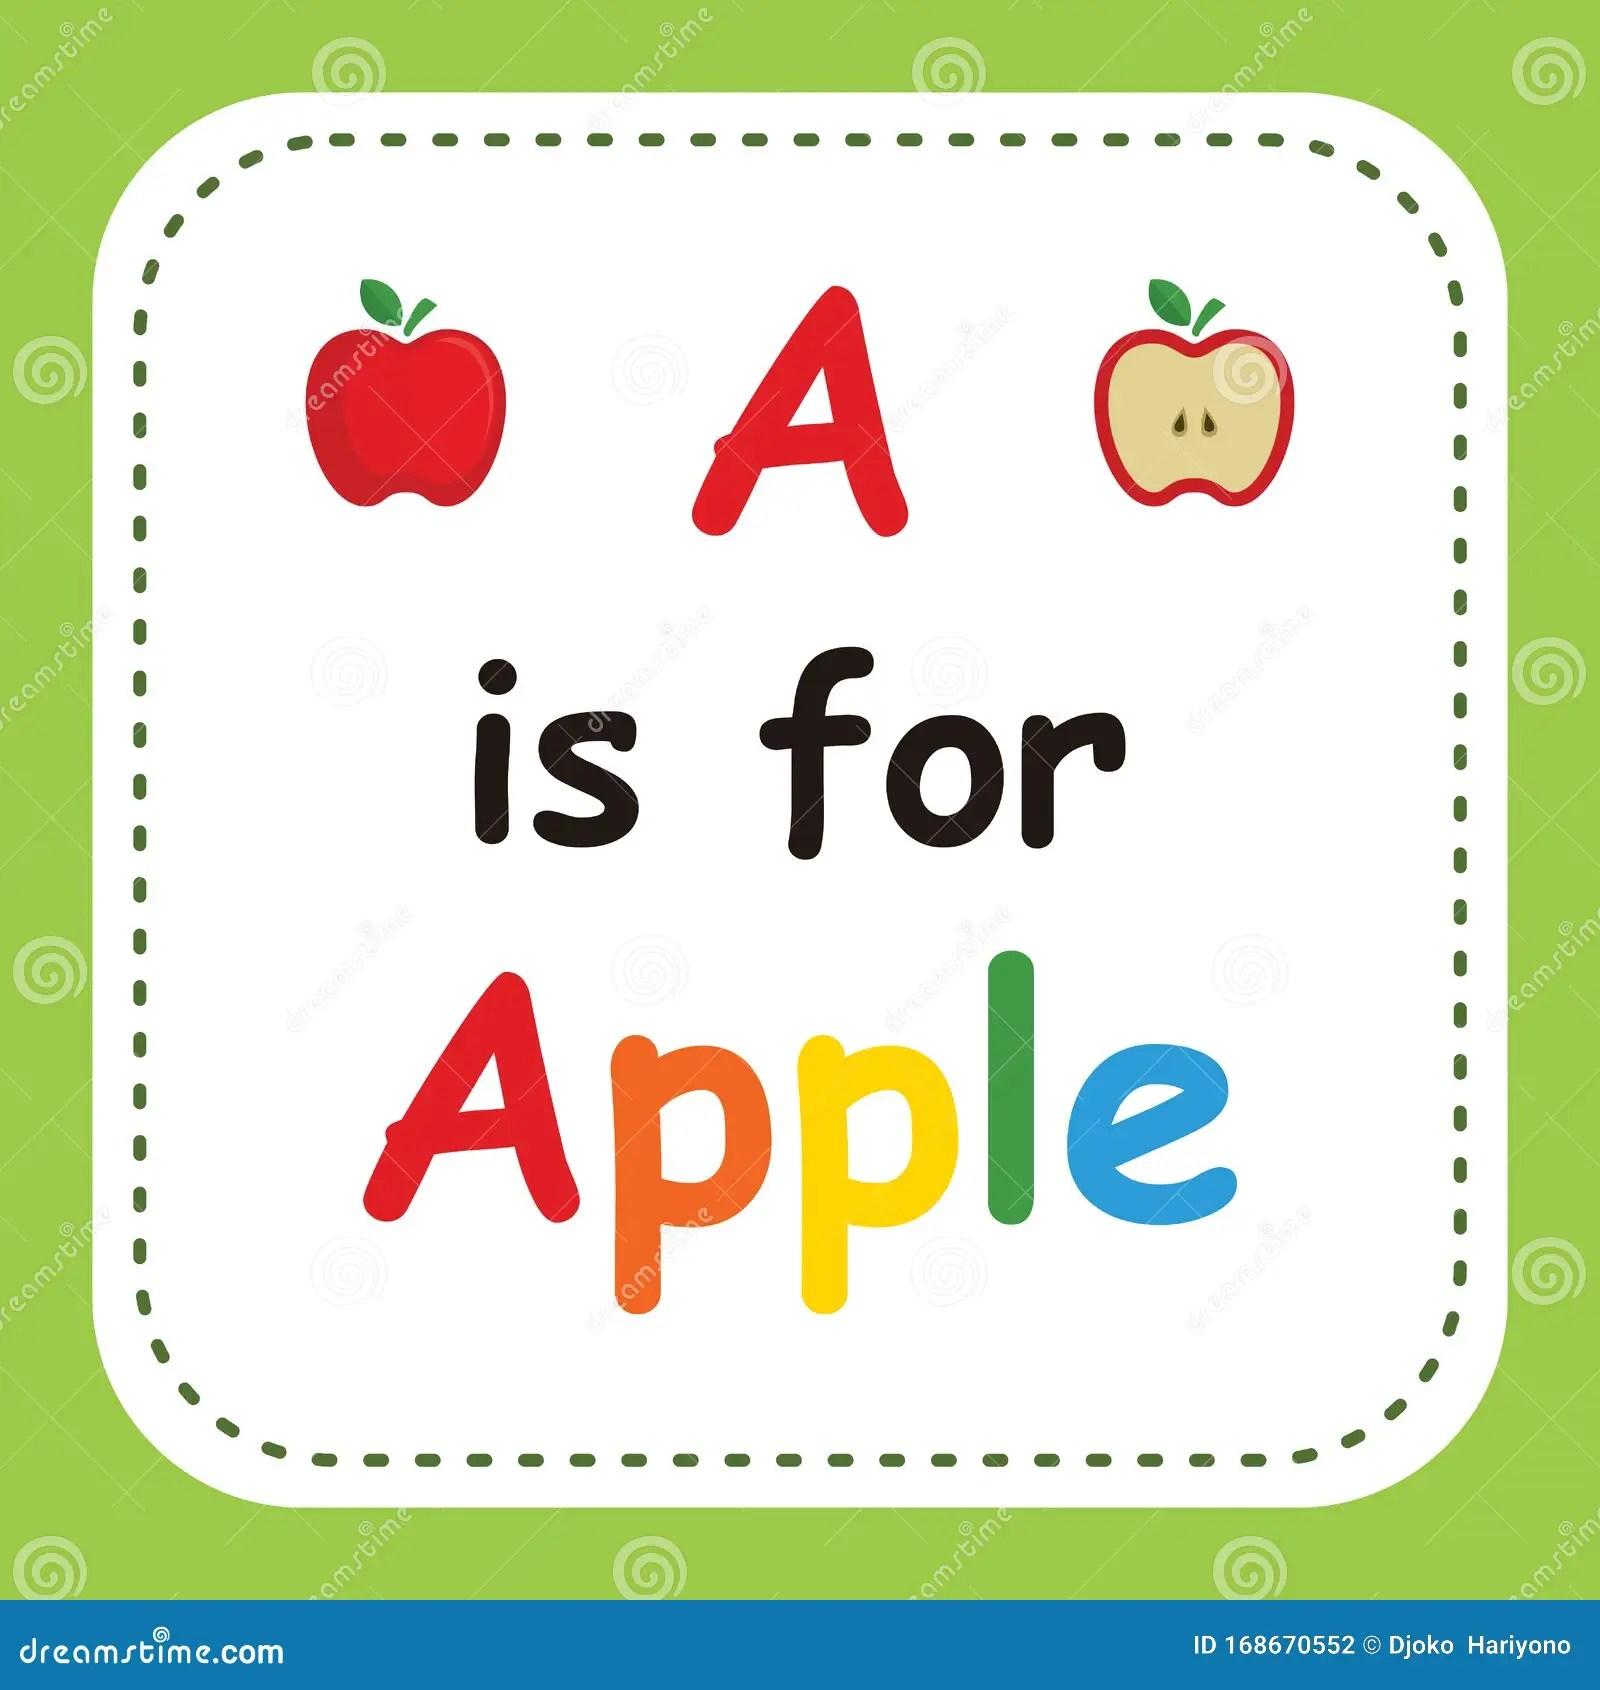 A Is For Apple Worksheet For Kindergarten Vector